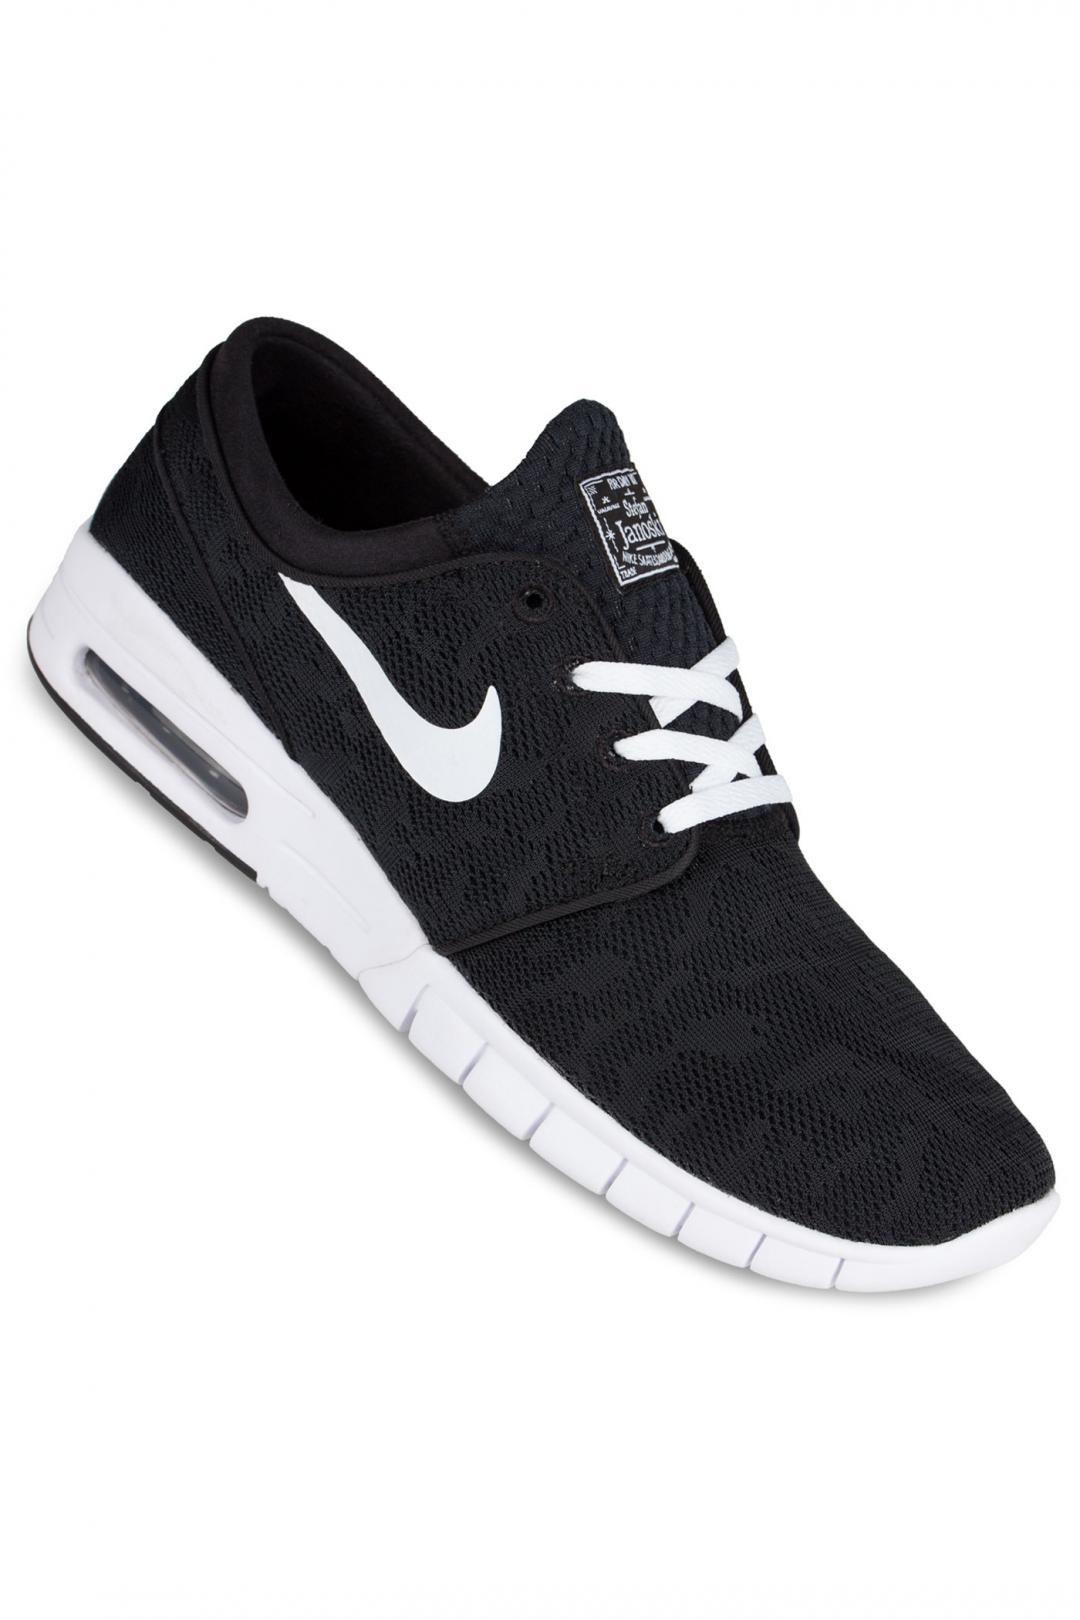 Uomo/Donna Nike SB Stefan Janoski Max black white | Sneaker